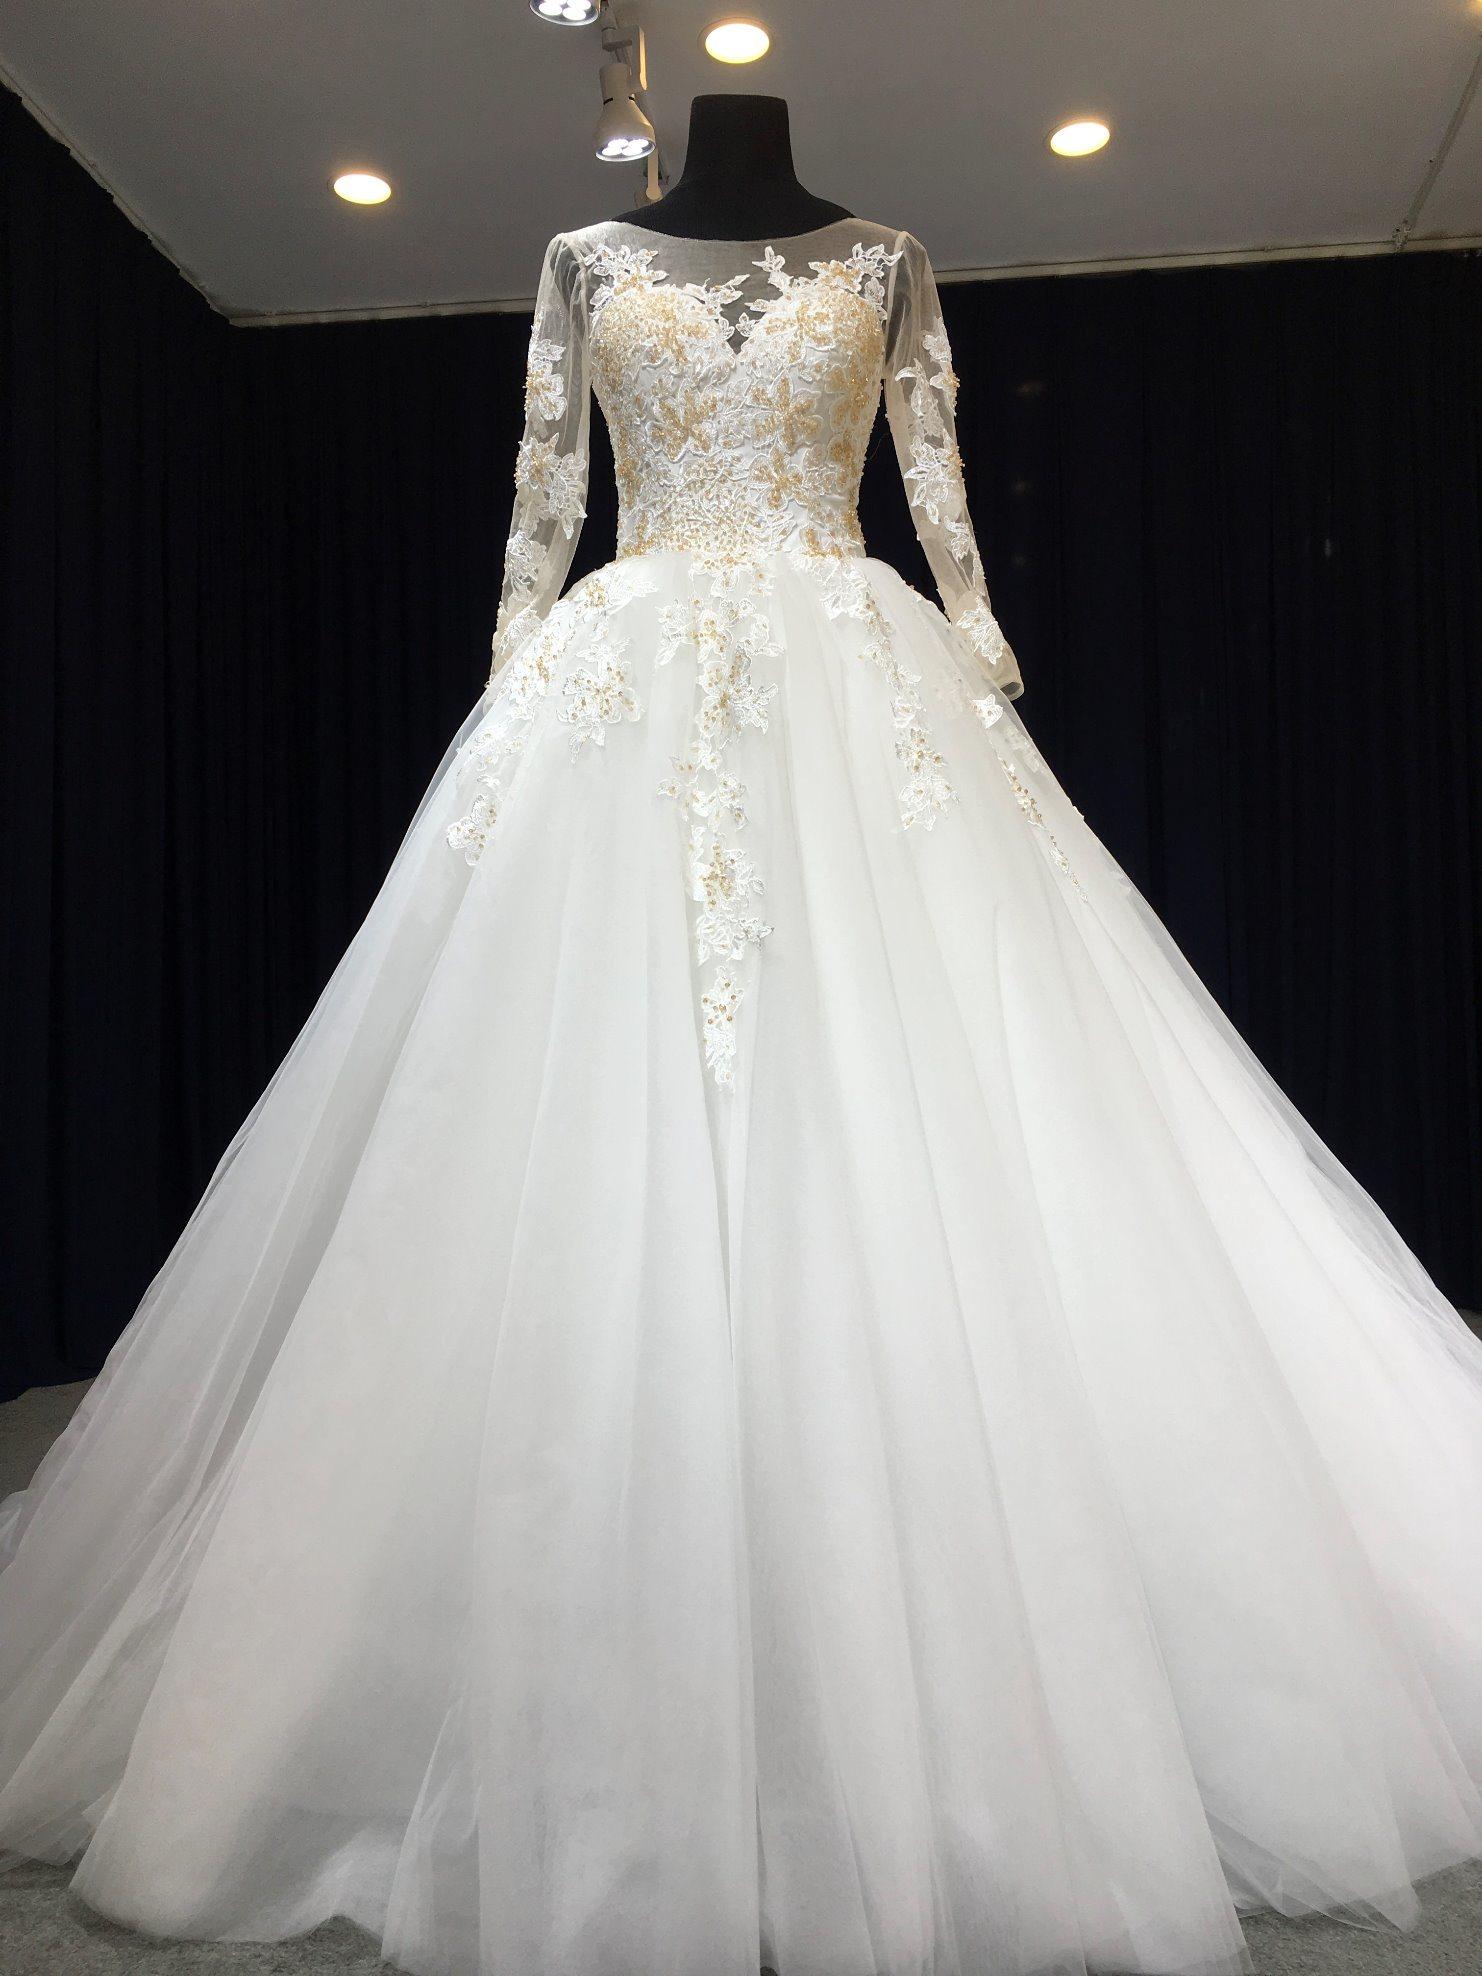 Newest Wedding Dress.Hot Item Aoliweiya Newest Designer Long Sleeve Wedding Dress